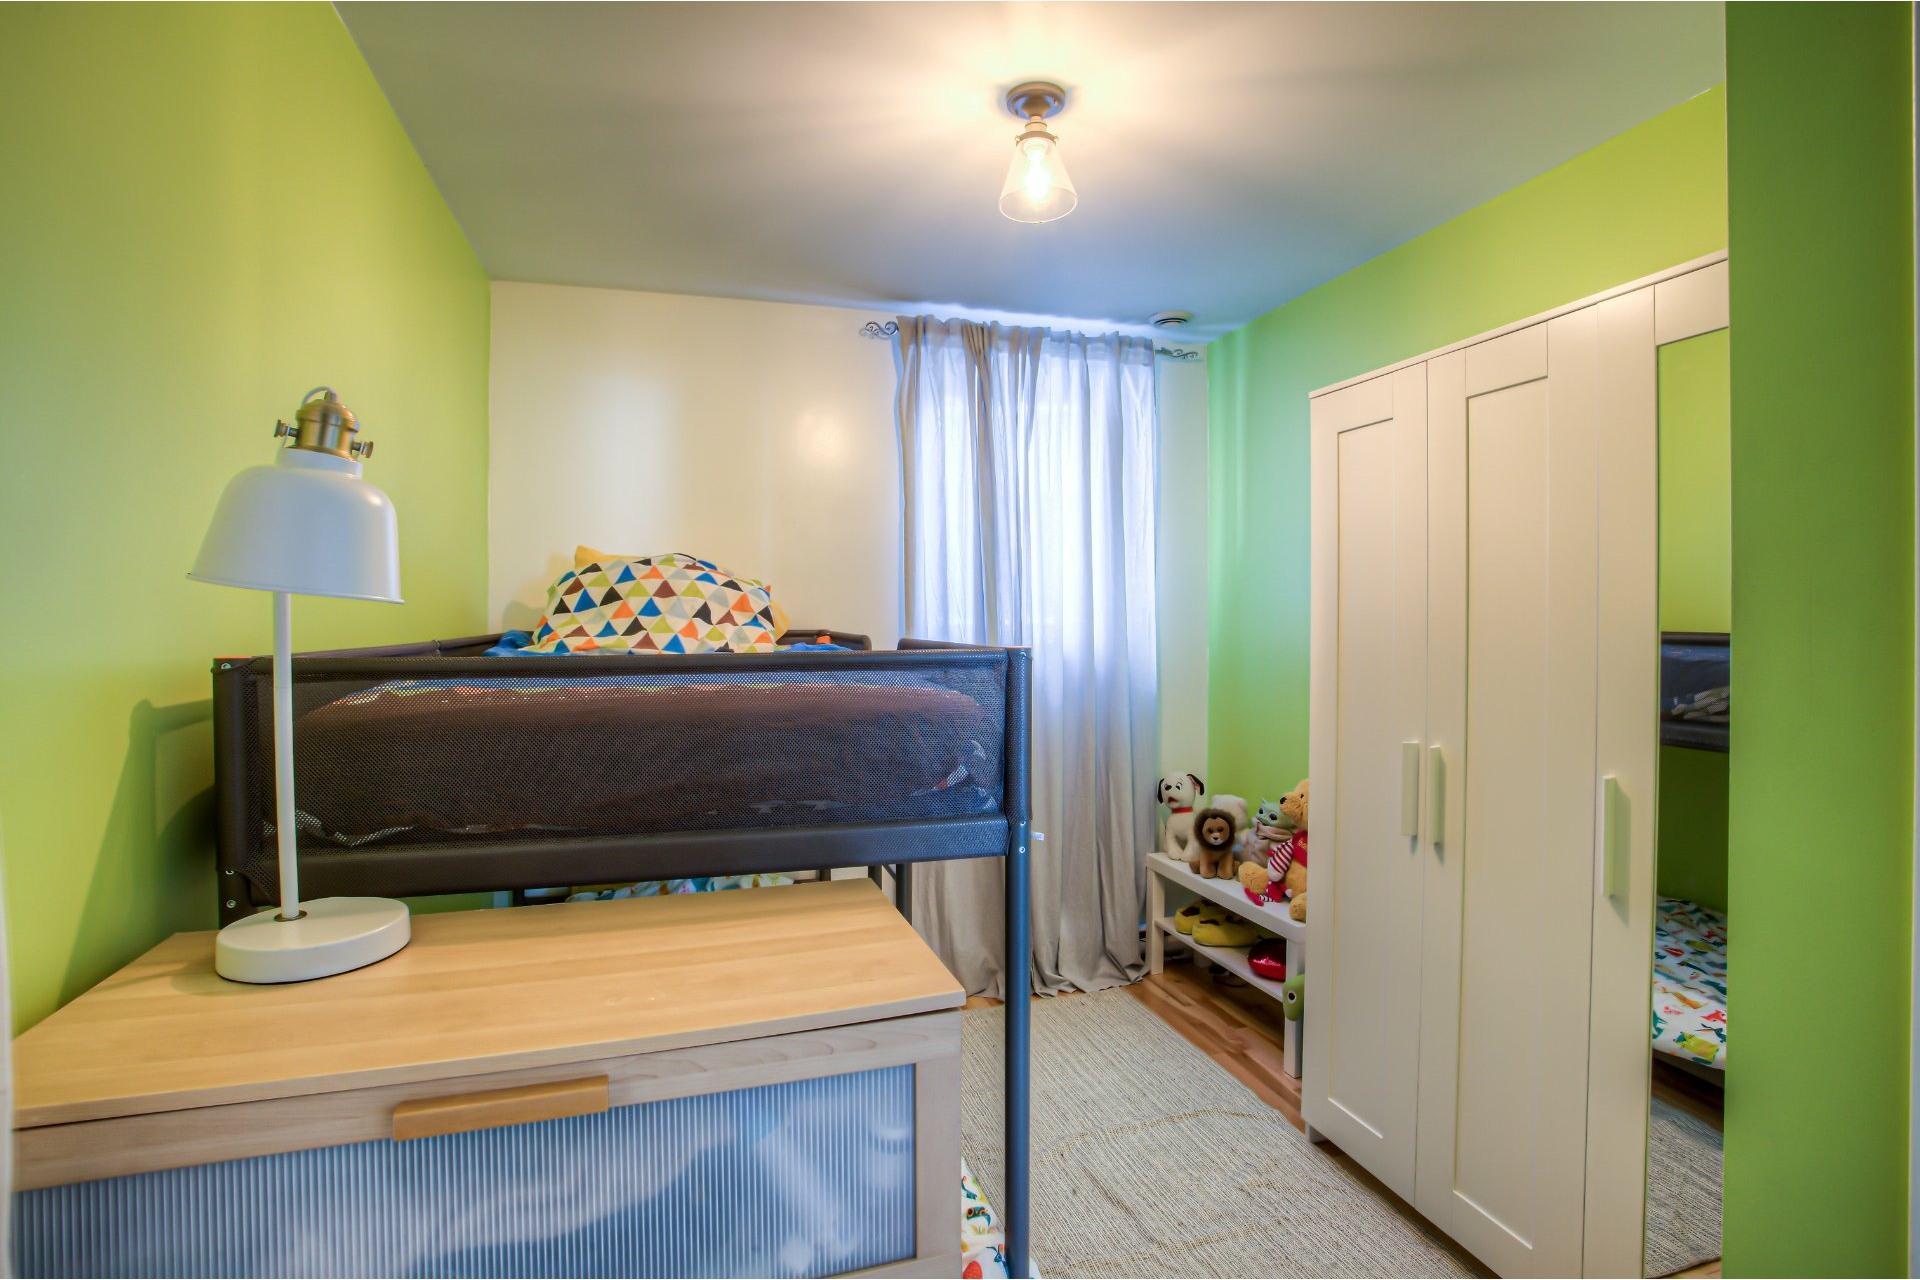 image 17 - Departamento Para alquiler Villeray/Saint-Michel/Parc-Extension Montréal  - 5 habitaciones